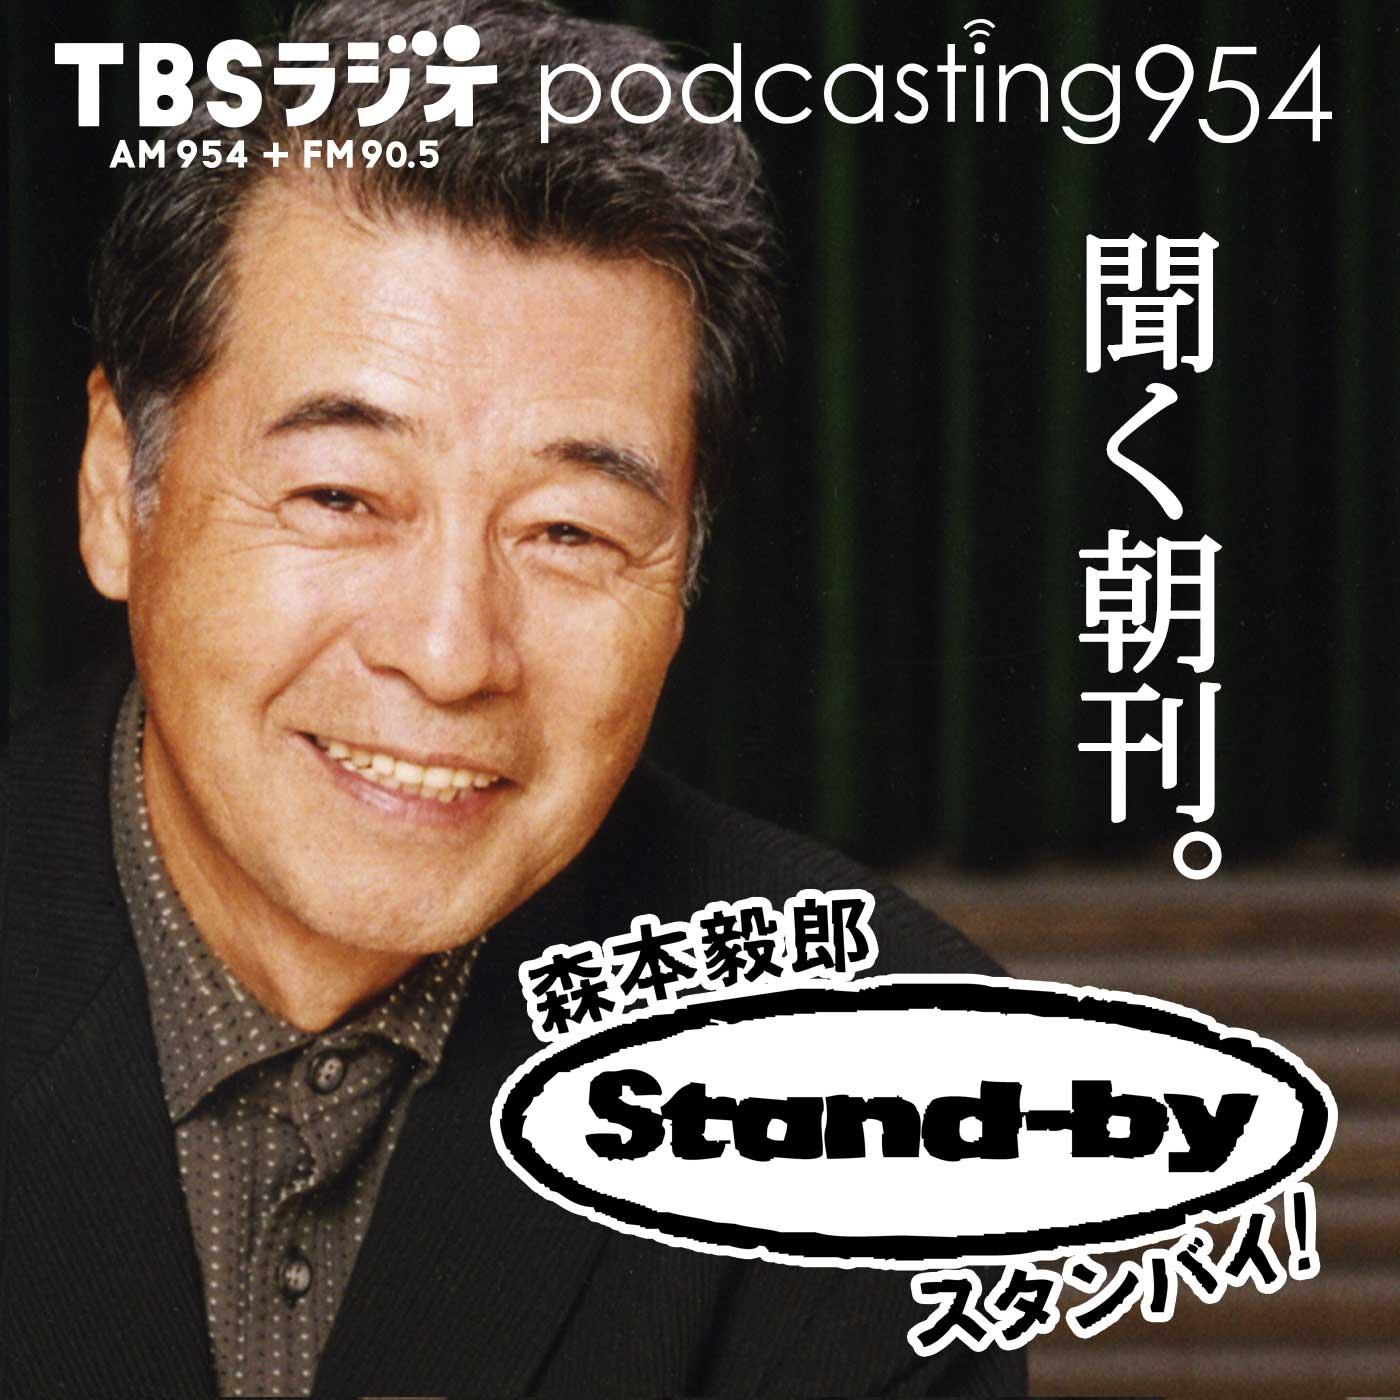 PODCAST-BP:森本毅郎・スタンバ...